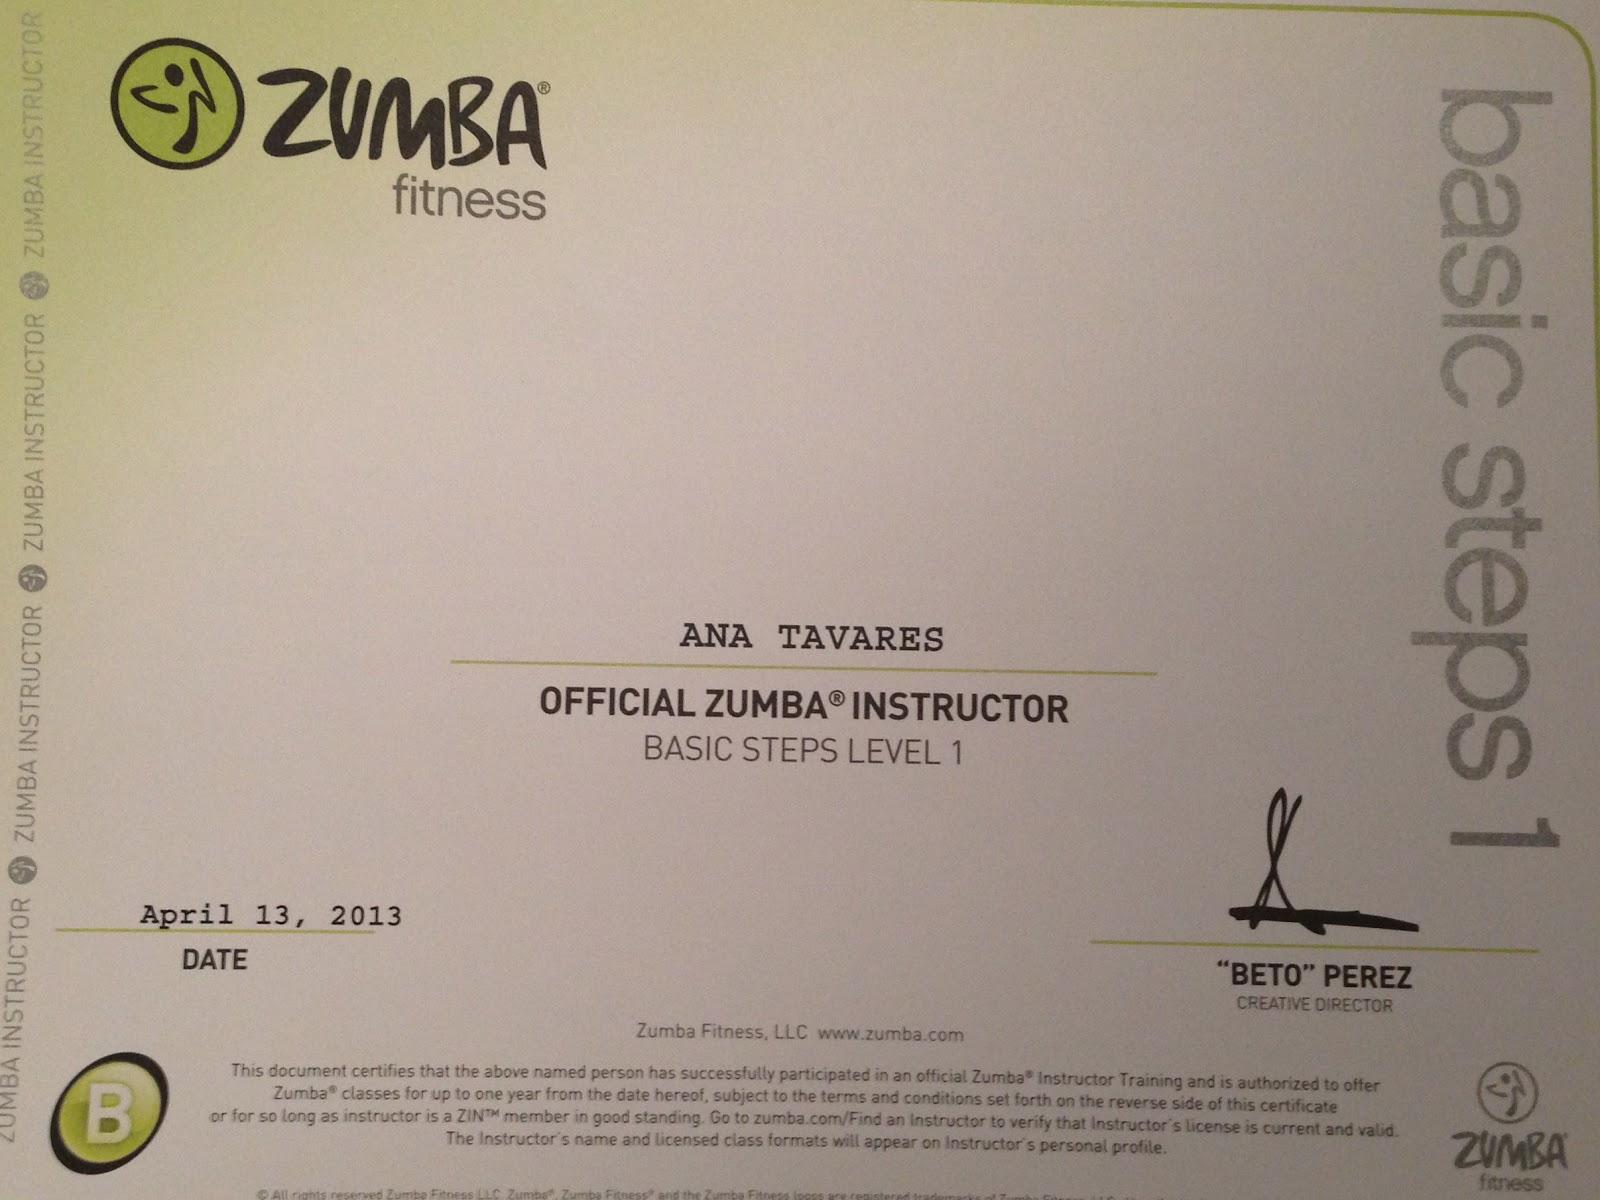 What to Expect - Zumba Instructor Training | Ana Tavares